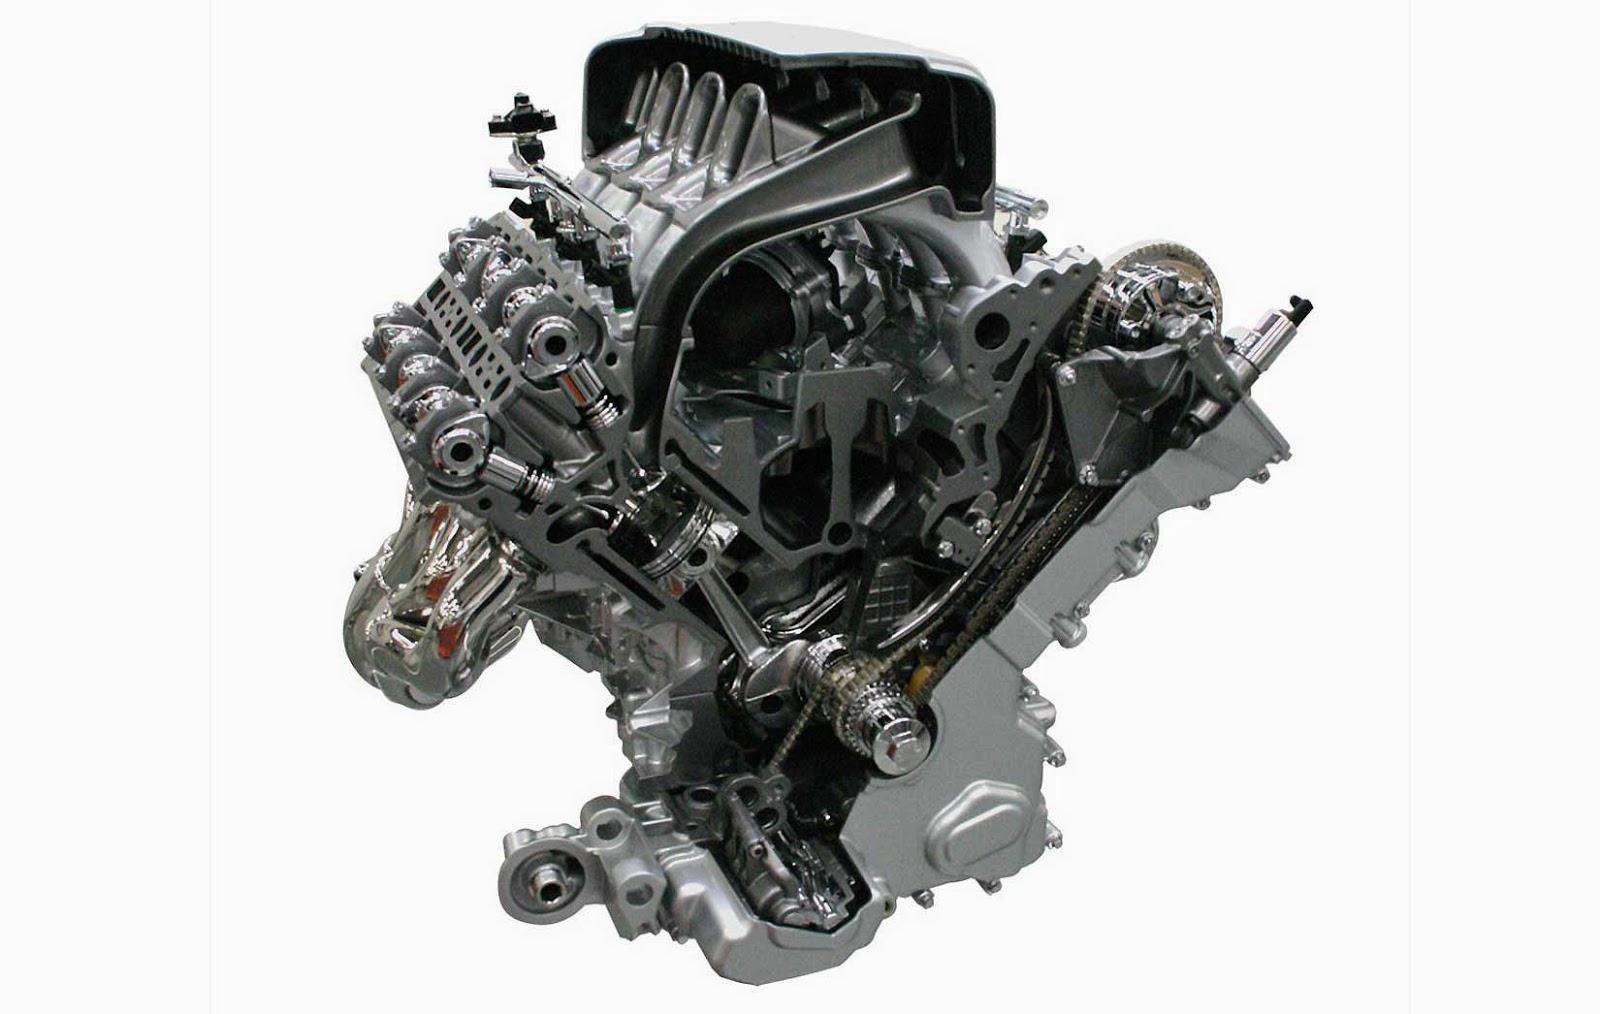 drivingandlife: The Power of Aston Martin - Successful ... on wooden car engine, aston martin lagonda, volkwagen engine, gallardo spyder engine, toyota iq, alfa romeo engine, nissan engine, rolls-royce phantom, lagonda engine, subaru engine, gobron-brillie engine, maserati engine, die another day, volvo s60, fiat engine, trike engine, vw engine, v12 engine, audi engine, aston martin one-77, aston martin virage, lamborghini murciélago, austin american engine, mazda engine, aston martin vantage, isuzu engine, luxury car engine, bmw z8, toyota engine, bmw engine, land rover engine, aston martin db4, aston martin rapide, aston martin dbs, aston martin dbs v12,